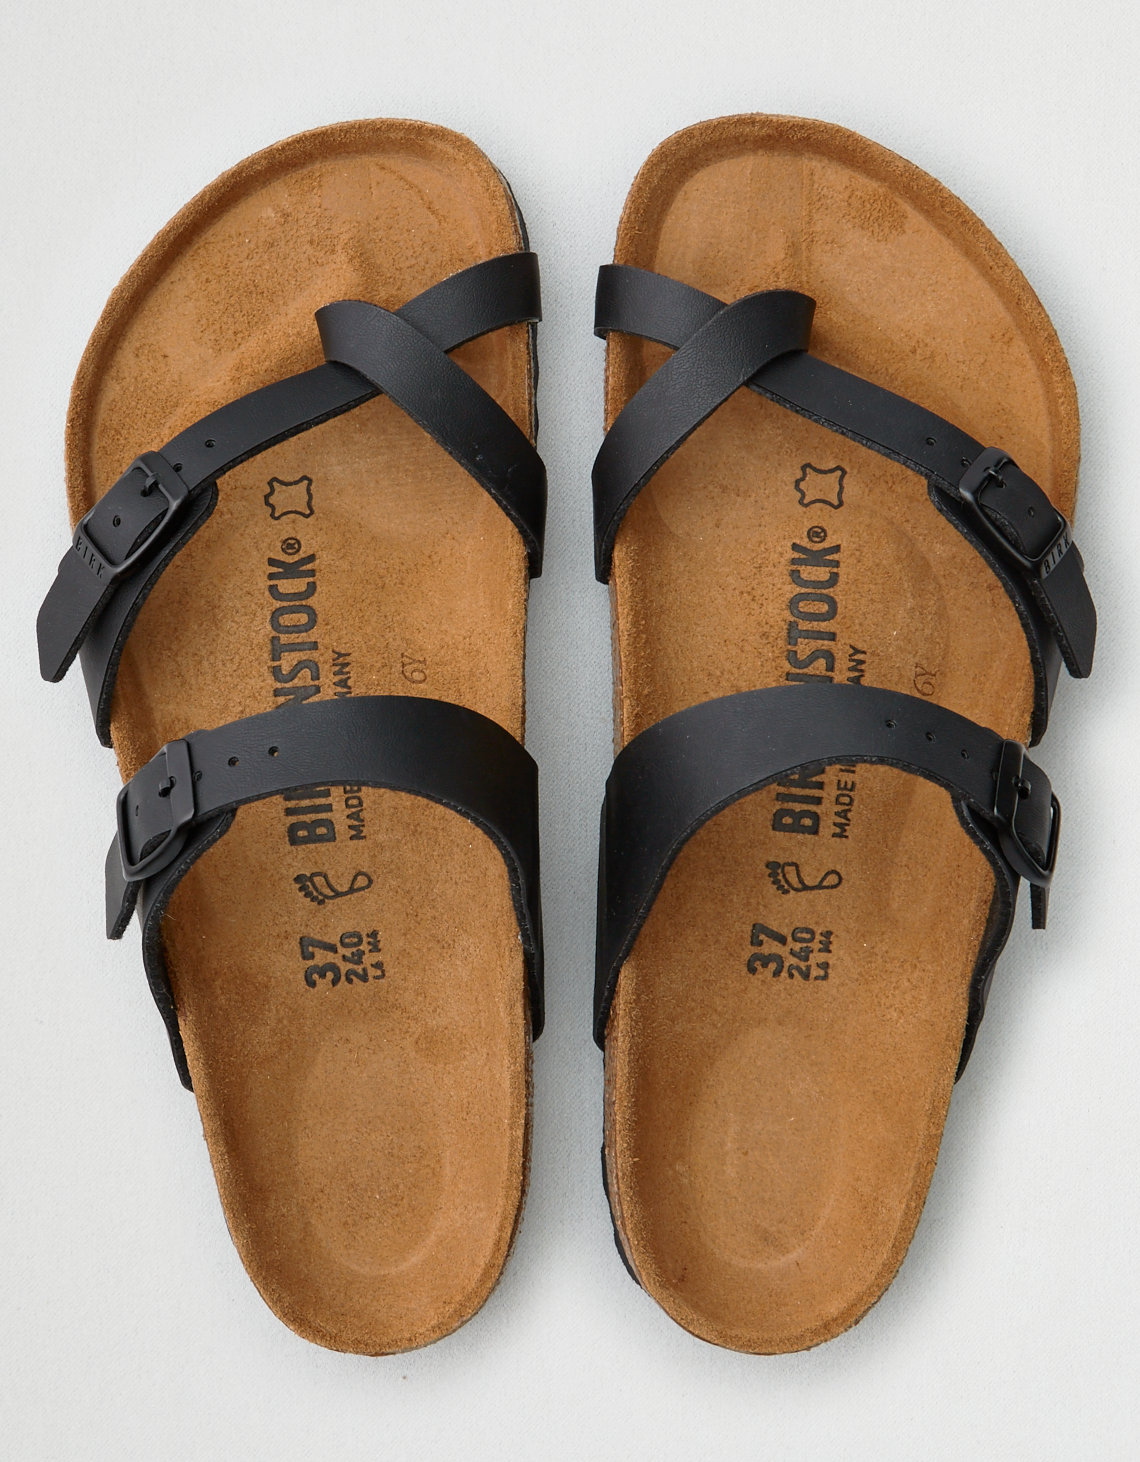 cb87b08e59d73 Birkenstock Mayari Sandal. Placeholder image. Product Image